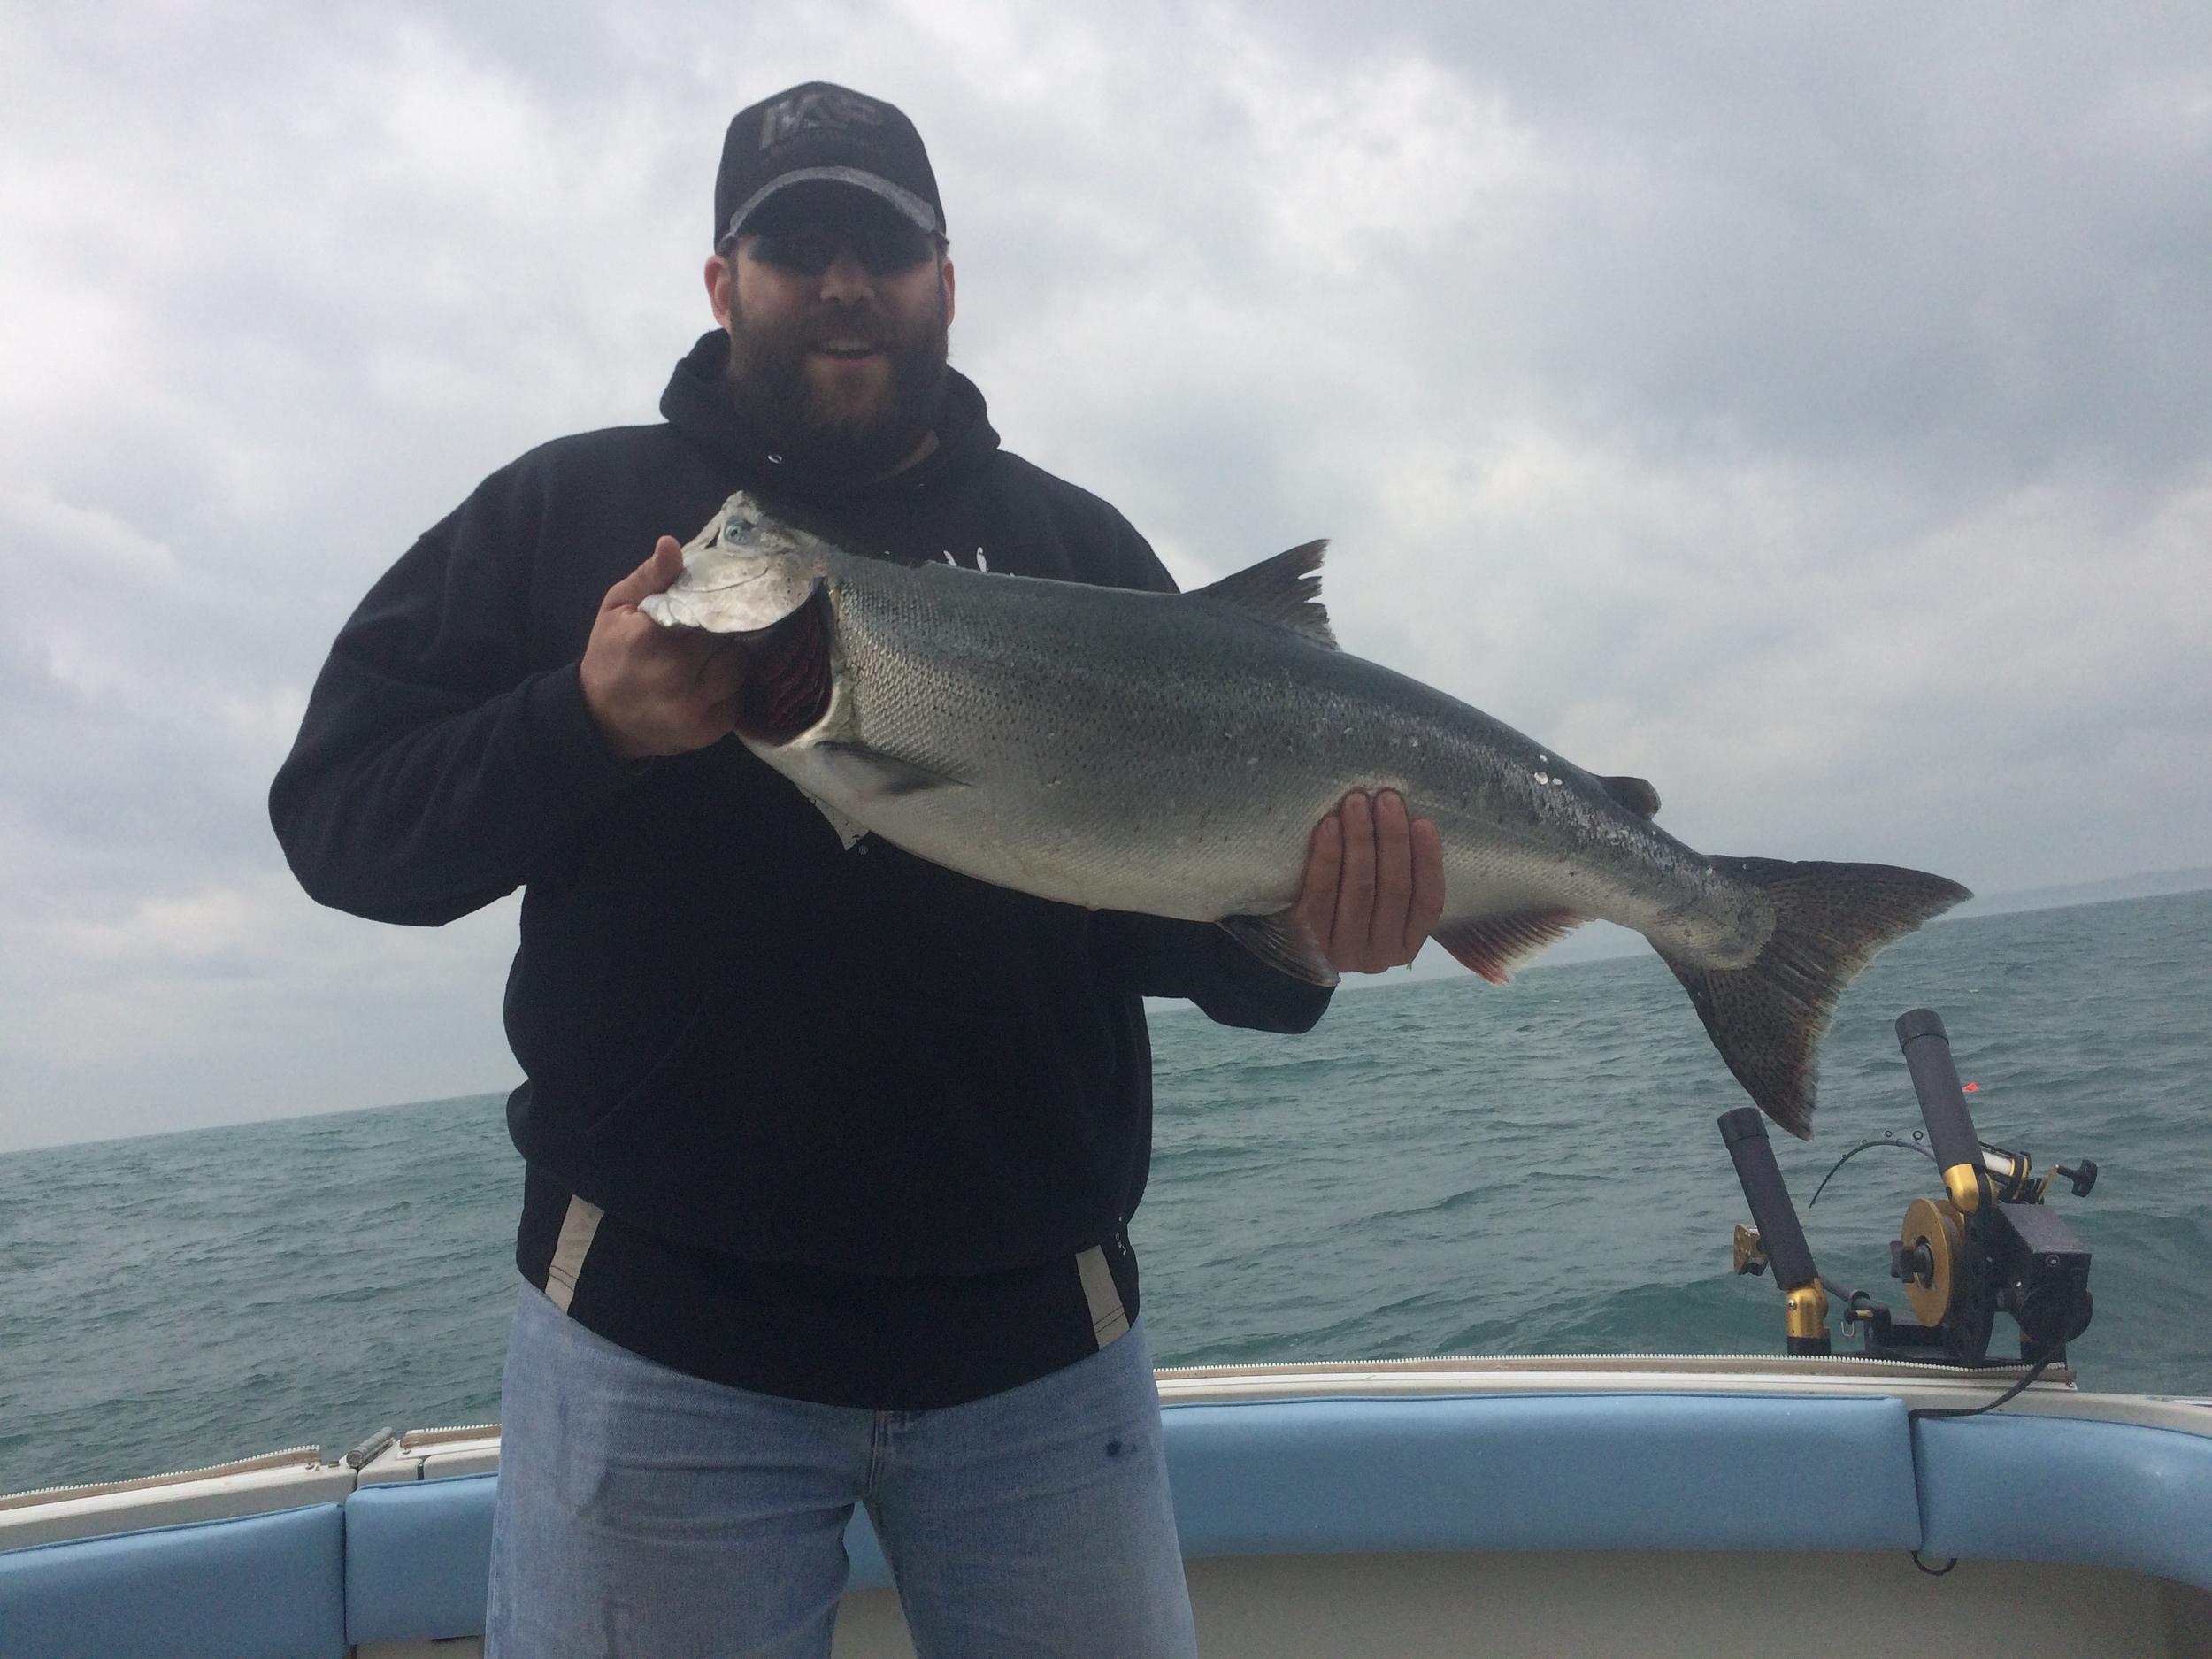 Unruly charter fishing port washington wisconsin lake for Washington fishing charters